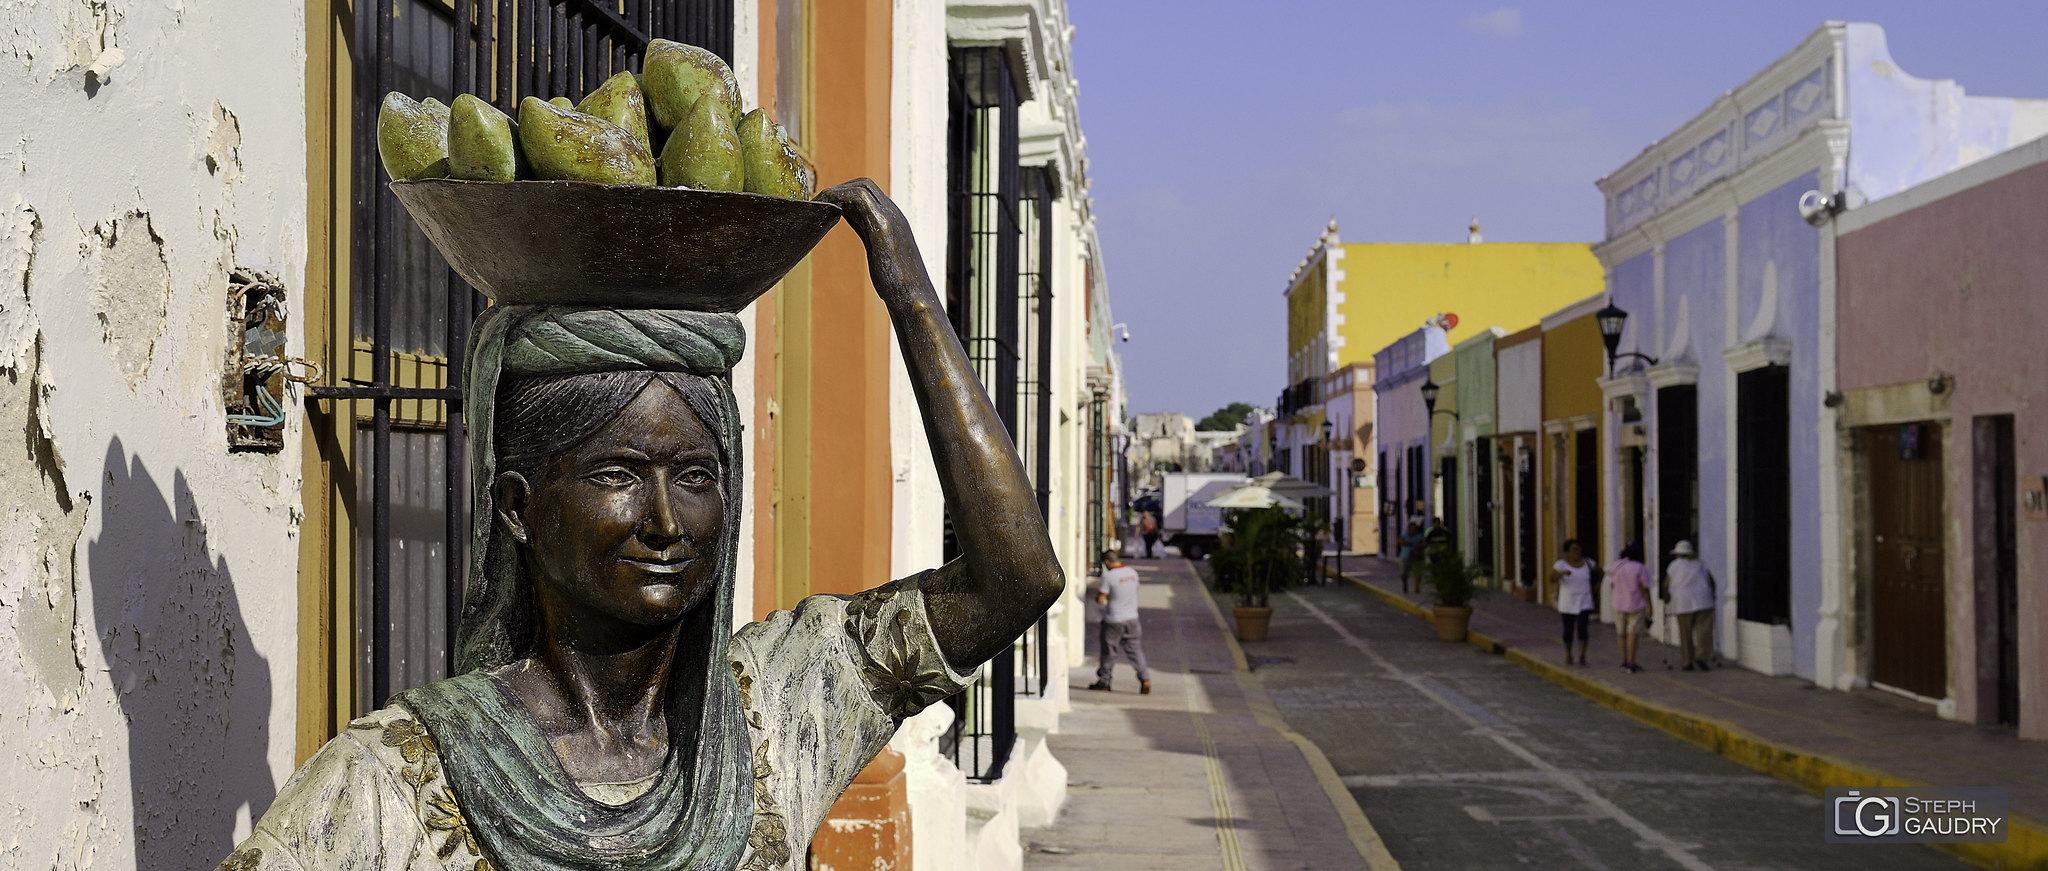 Campeche - Statue de femme avec panier de fruits [Click to start slideshow]